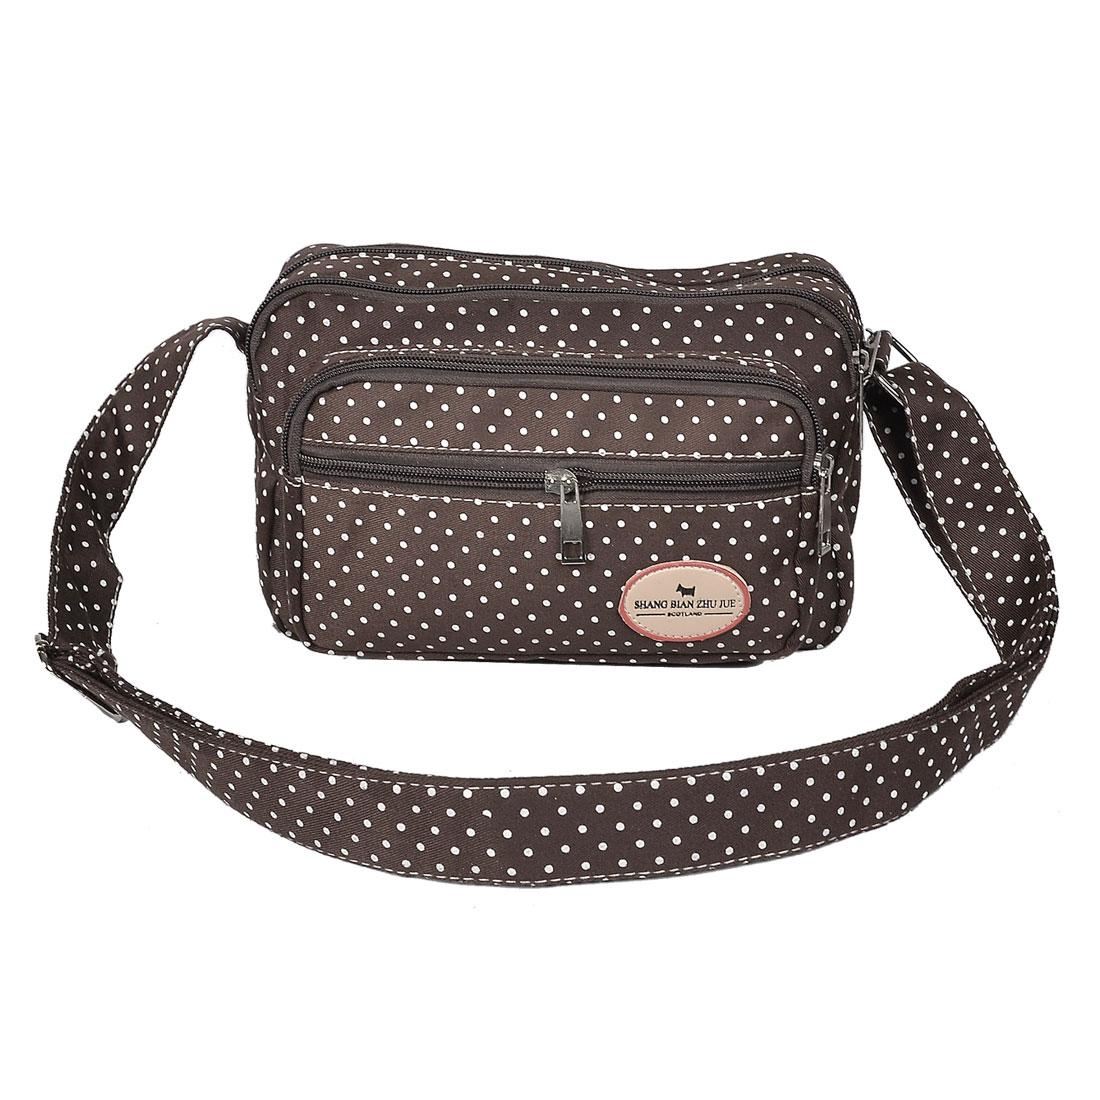 Zipper Closure Dot Print 4 Pocket Dark Coffee Shoulder Bag Handbag for Lady